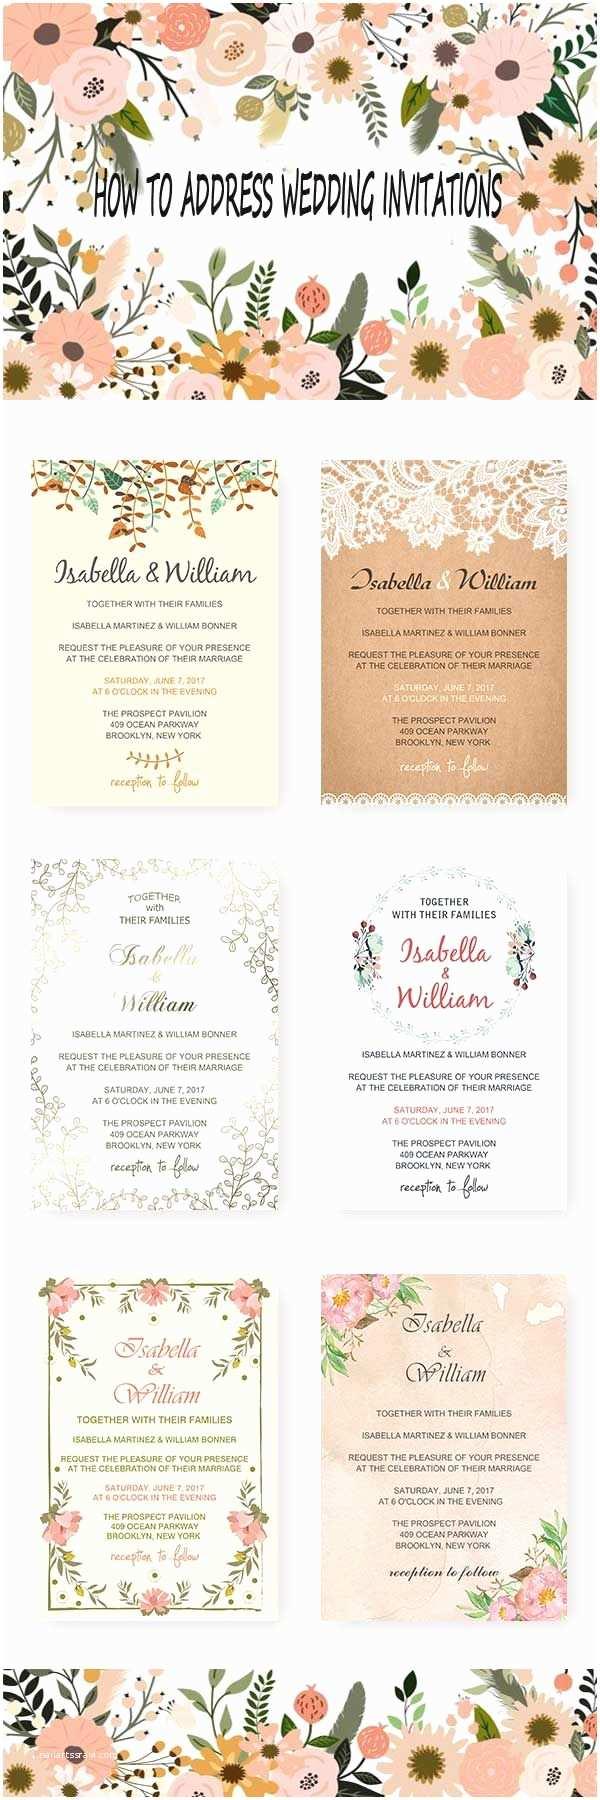 Fall Wedding Invitations Cheap Best 25 Fall Wedding Invitations Ideas On Pinterest